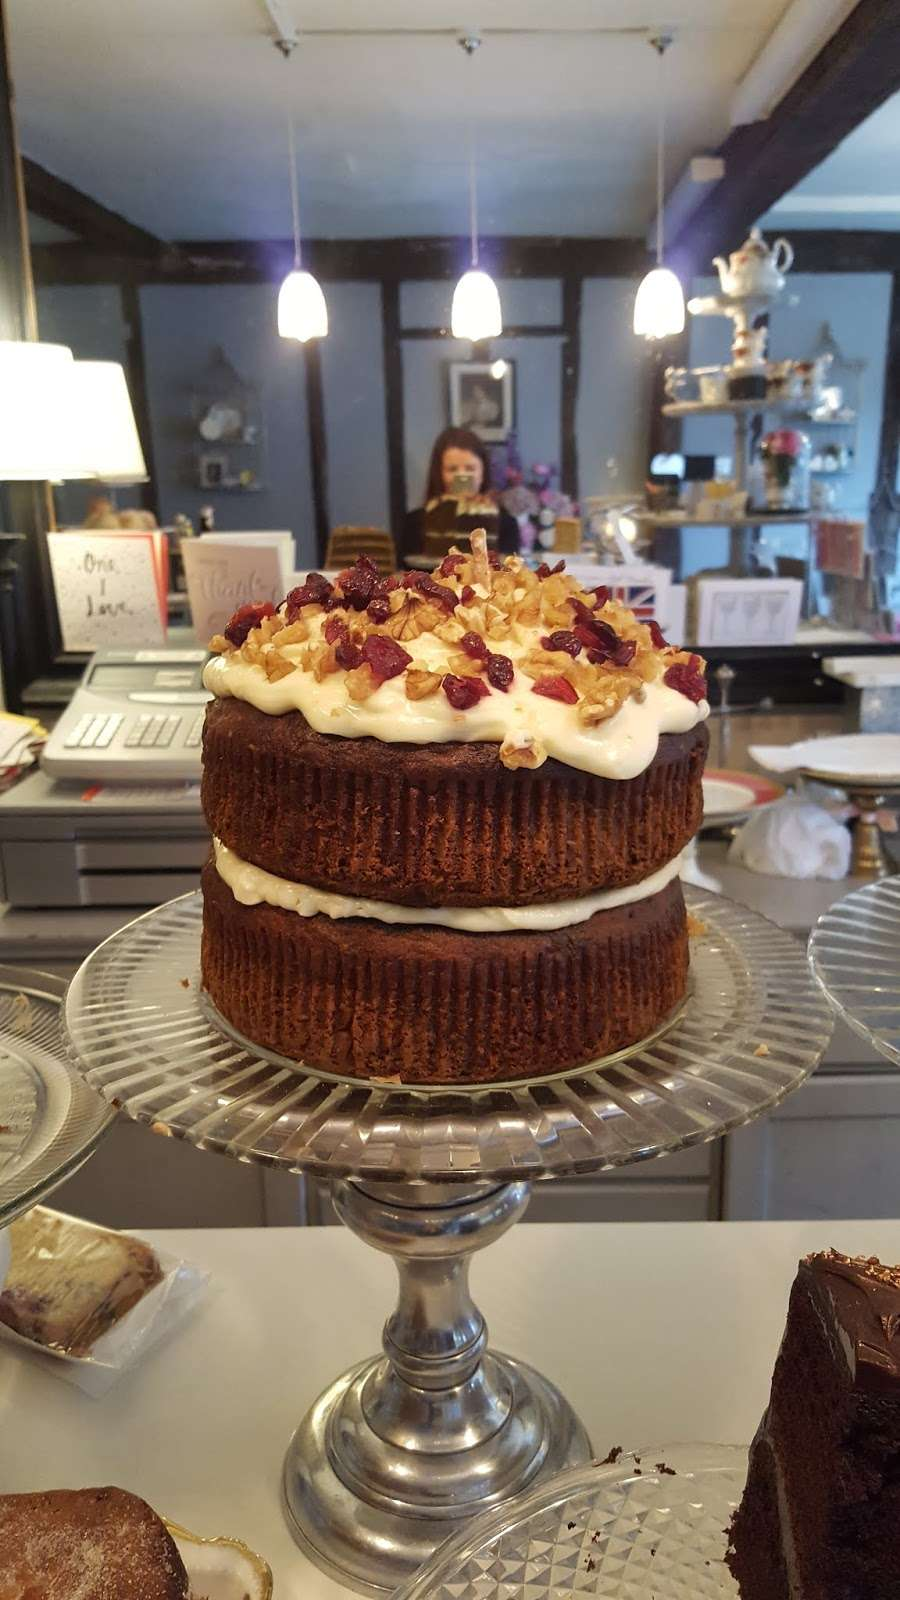 Lamingtons - cafe    Photo 7 of 10   Address: 25 High St, Bletchingley, Redhill RH1 4PB, UK   Phone: 07751 405020